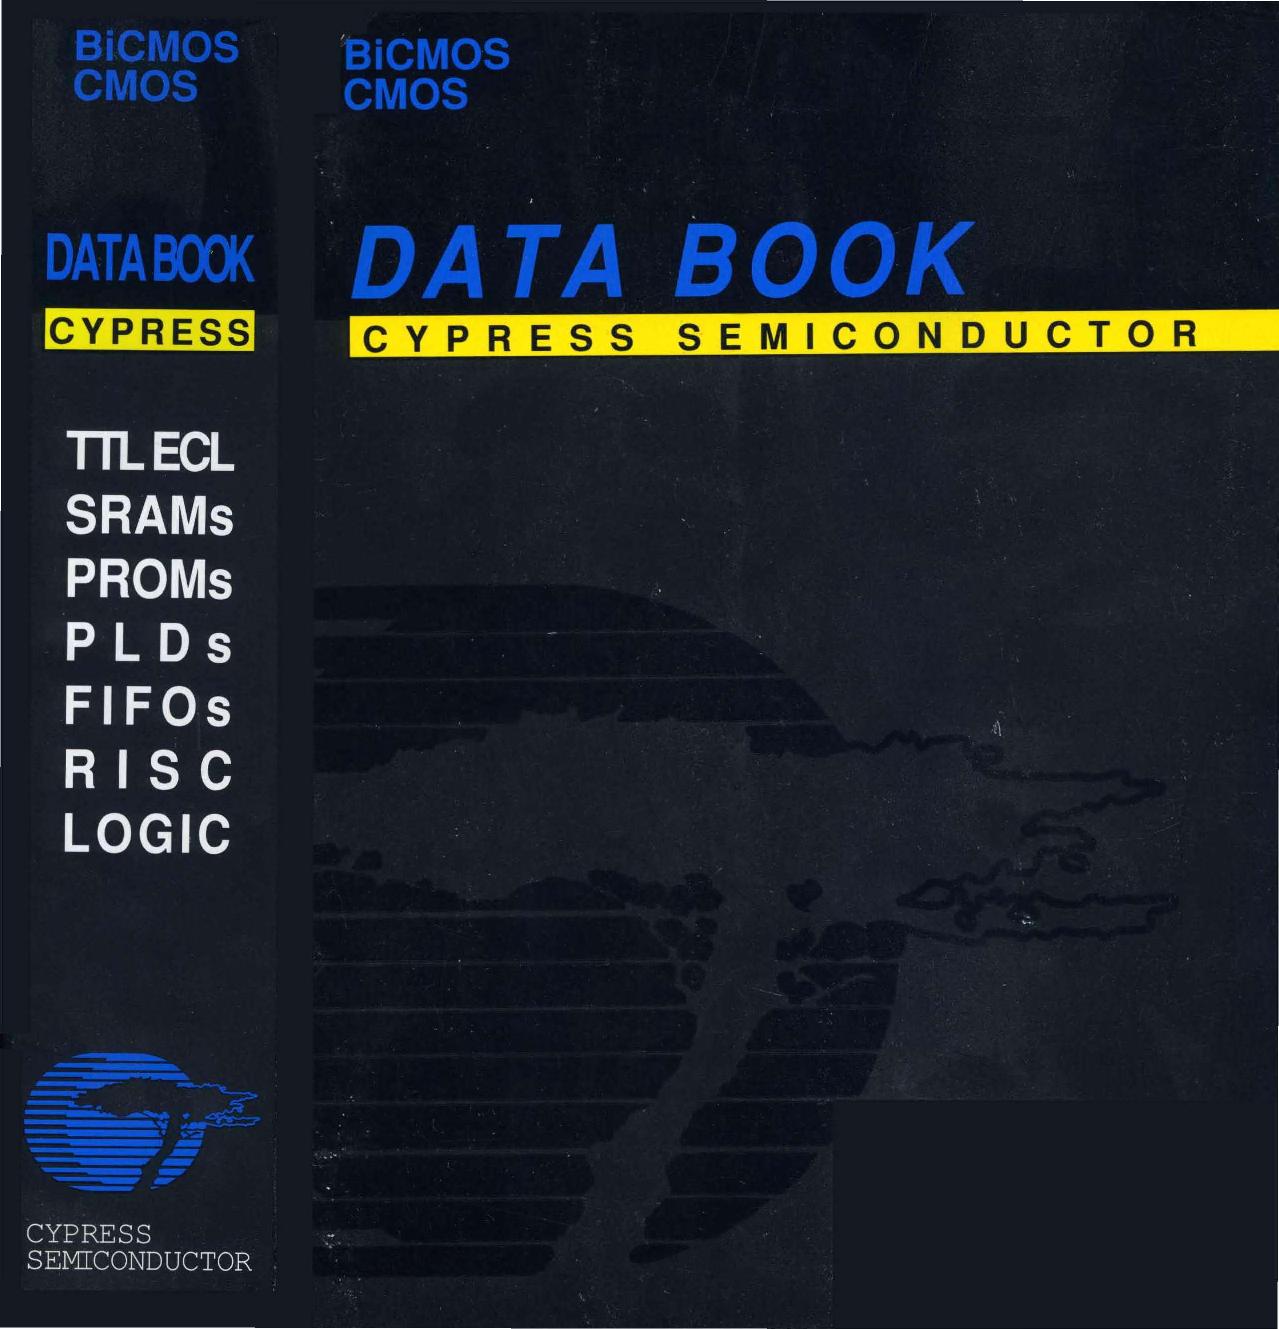 1992_Cypress_Bi CMOS_CMOS_Data_Book 1992 Cypress Bi CMOS Data Book